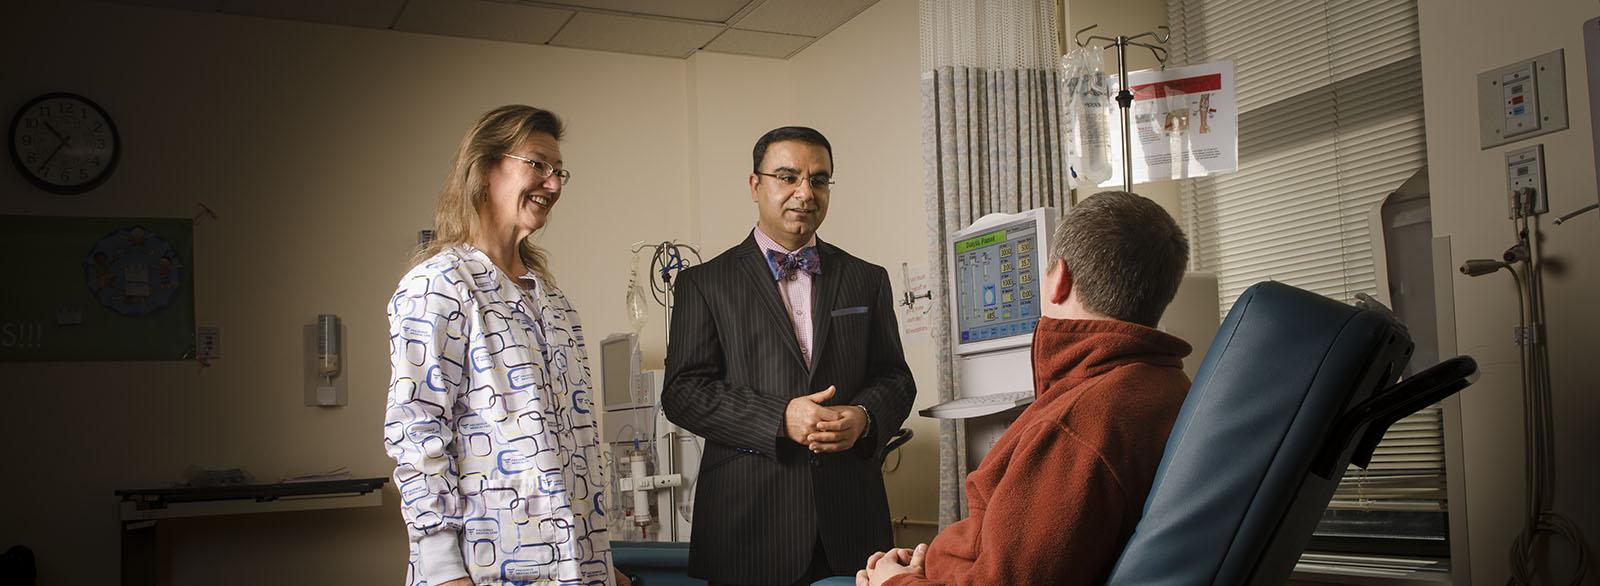 Dialysis Services | Columbus Regional Health